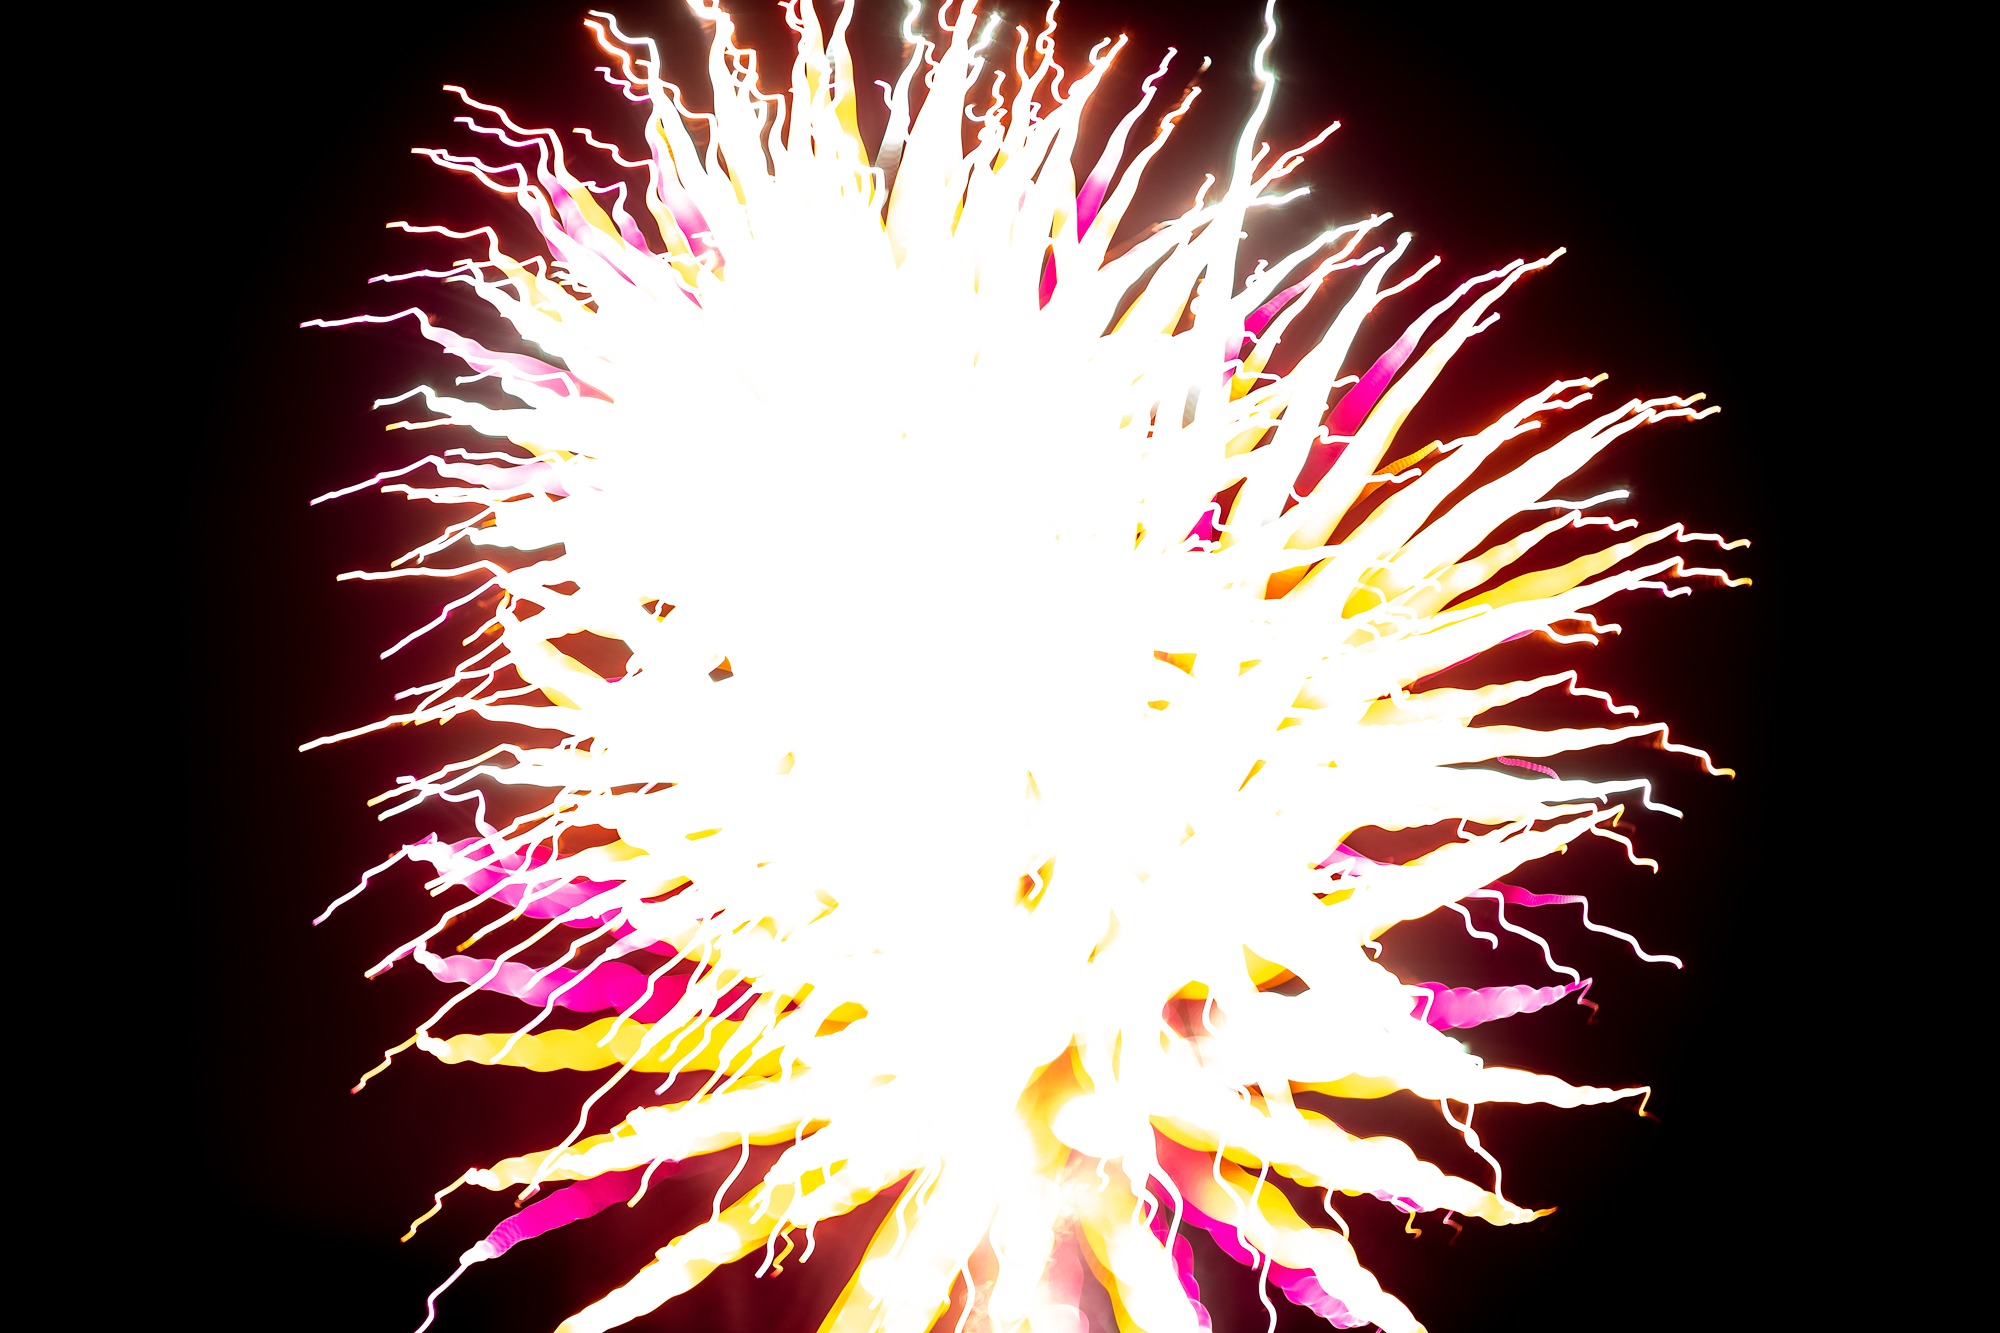 2018.07.03-scrantonFireworks-M1005416-WEB.jpg